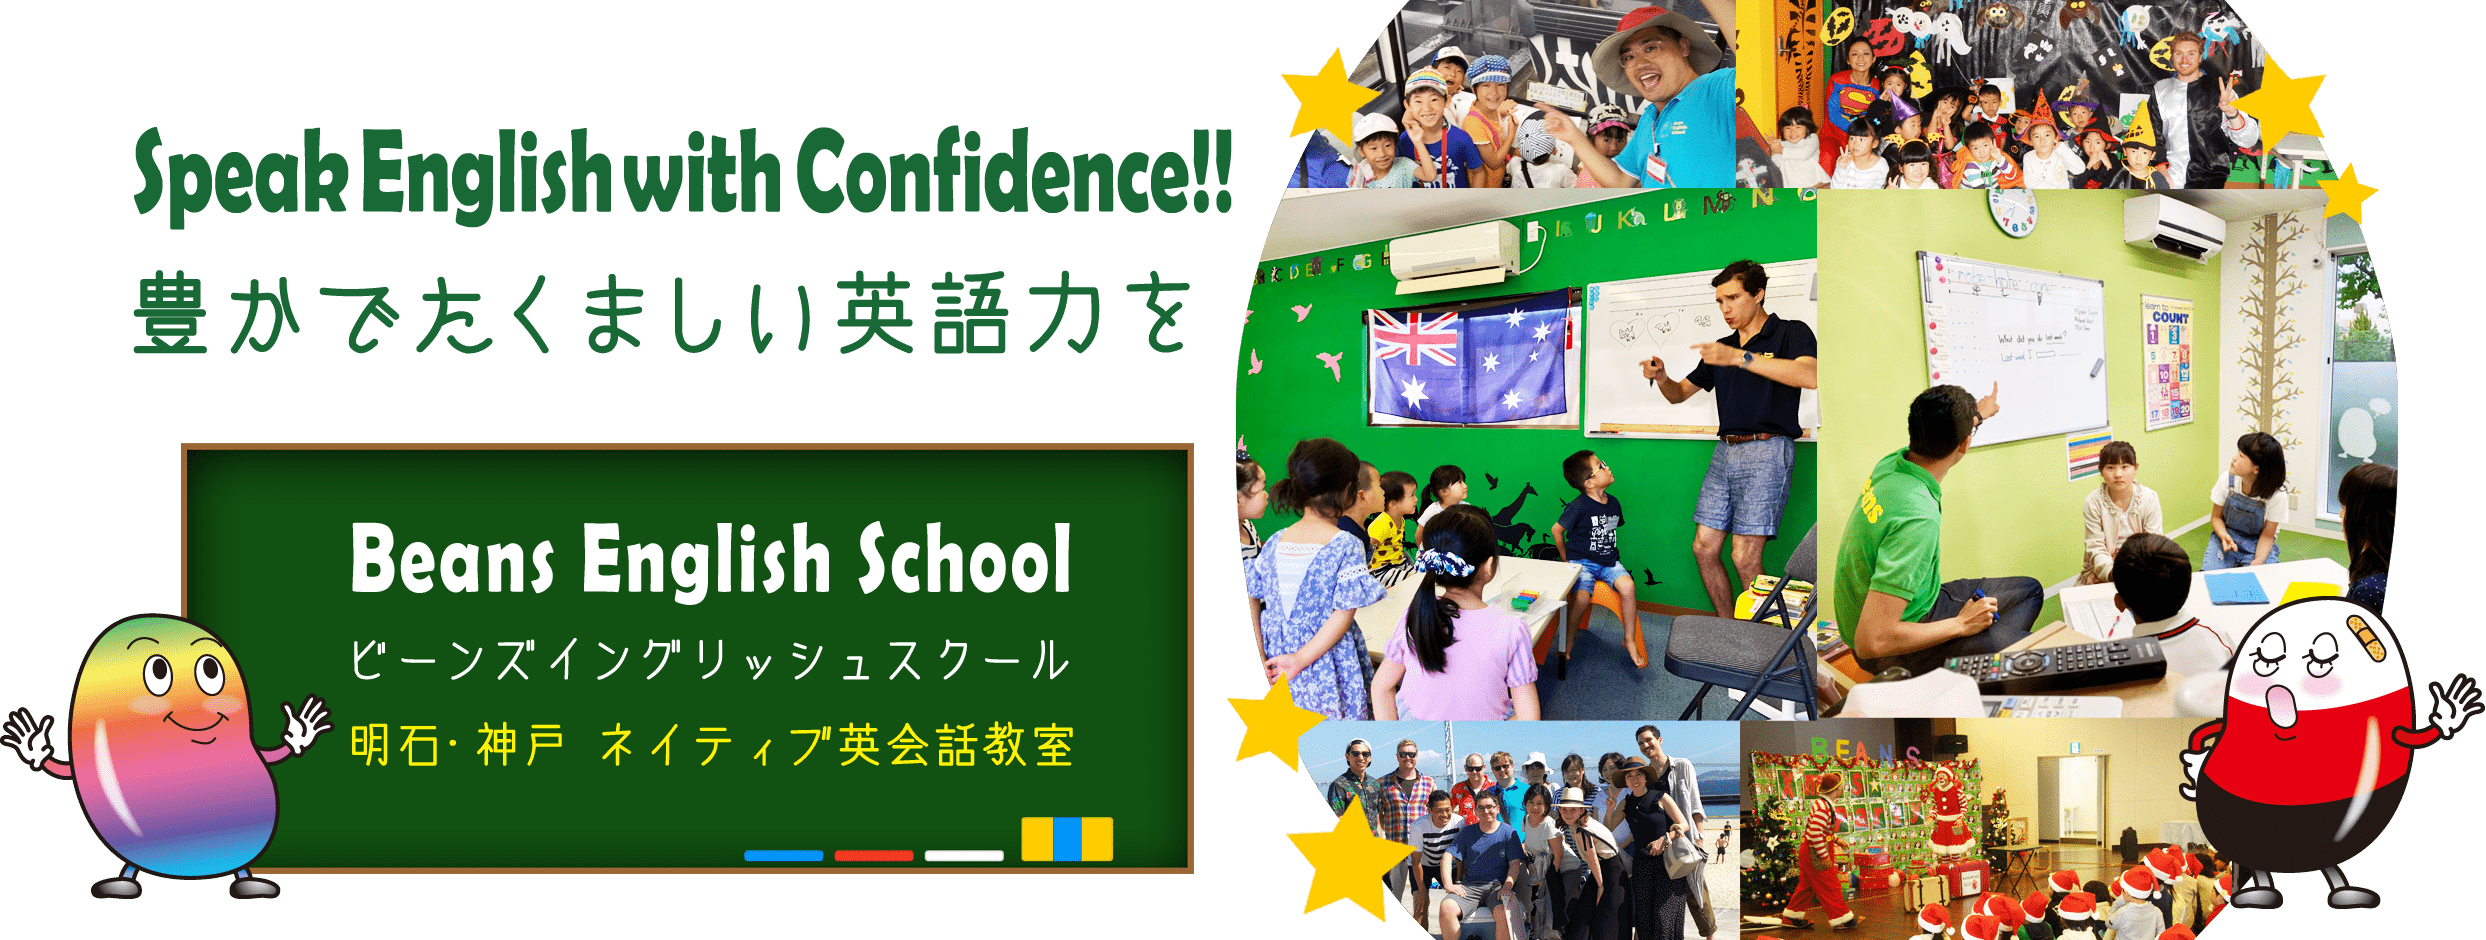 Speak English with Confidence!! 豊かでたくましい英語力を Beans English School Beans English School 明石・神戸 ネイティブ英会話教室